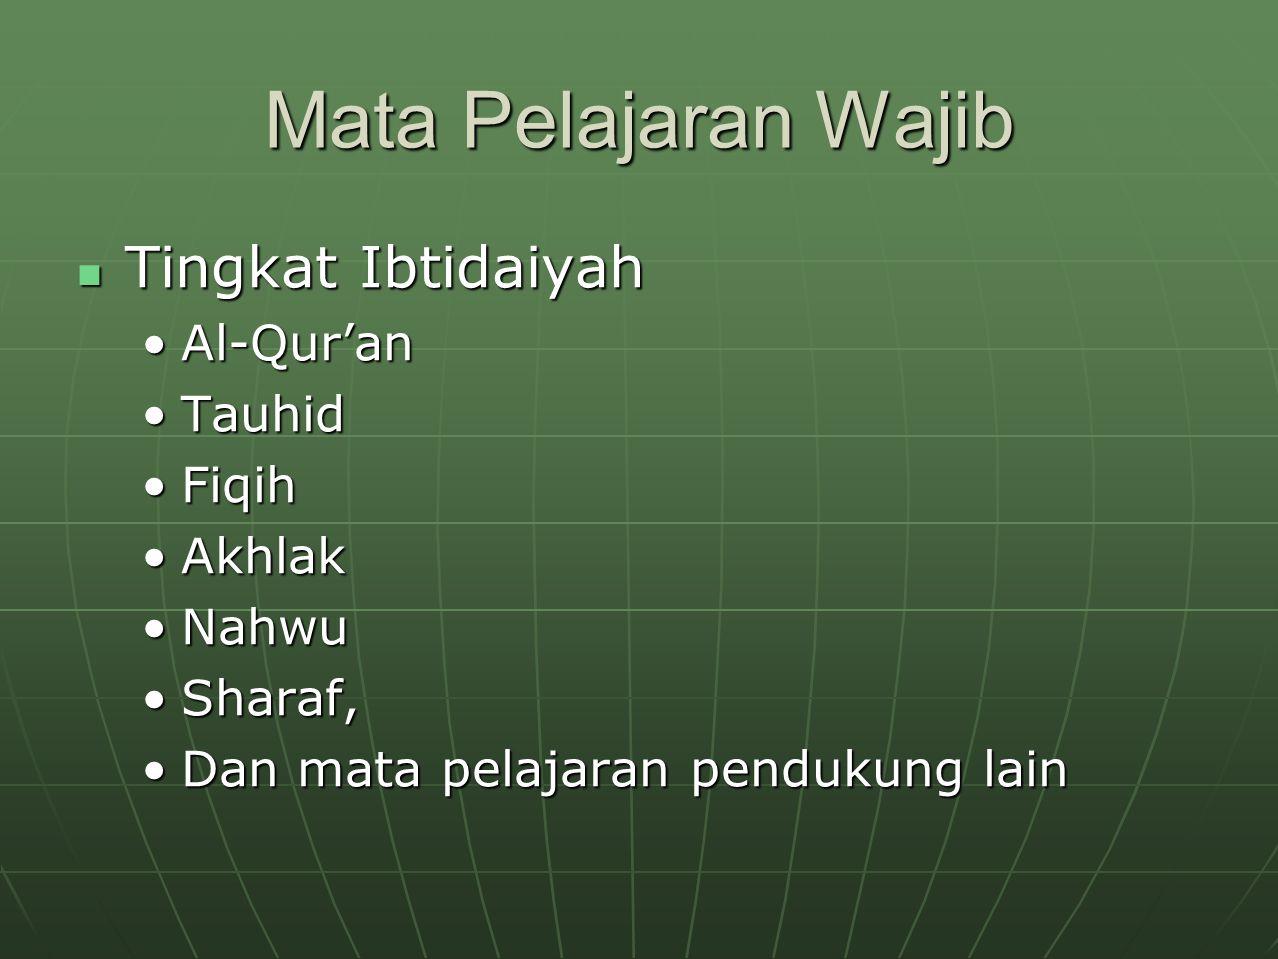 Mata Pelajaran Wajib Tingkat Ibtidaiyah Al-Qur'an Tauhid Fiqih Akhlak